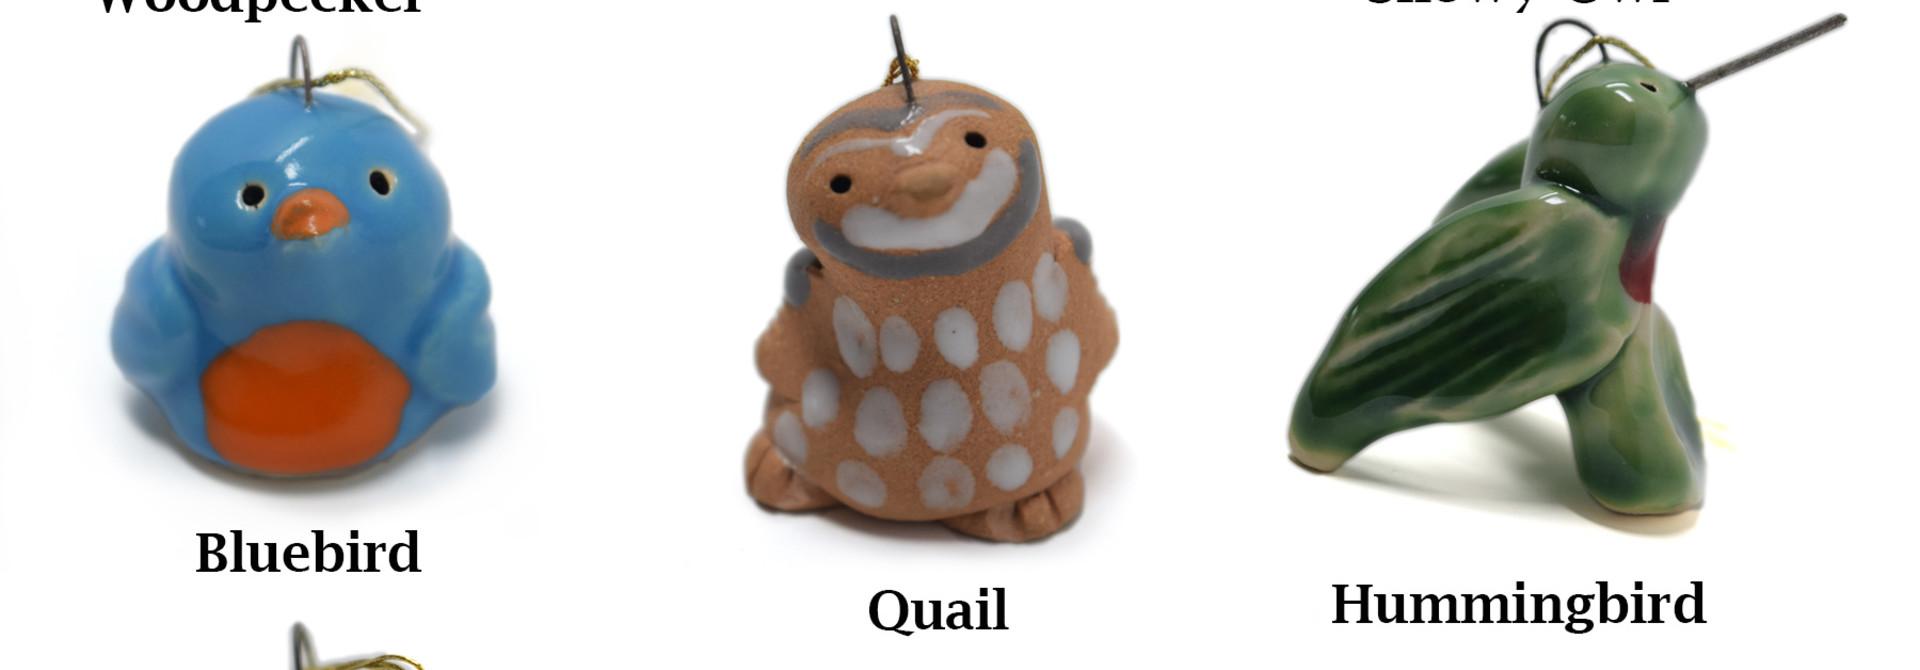 Little Guys Ornaments